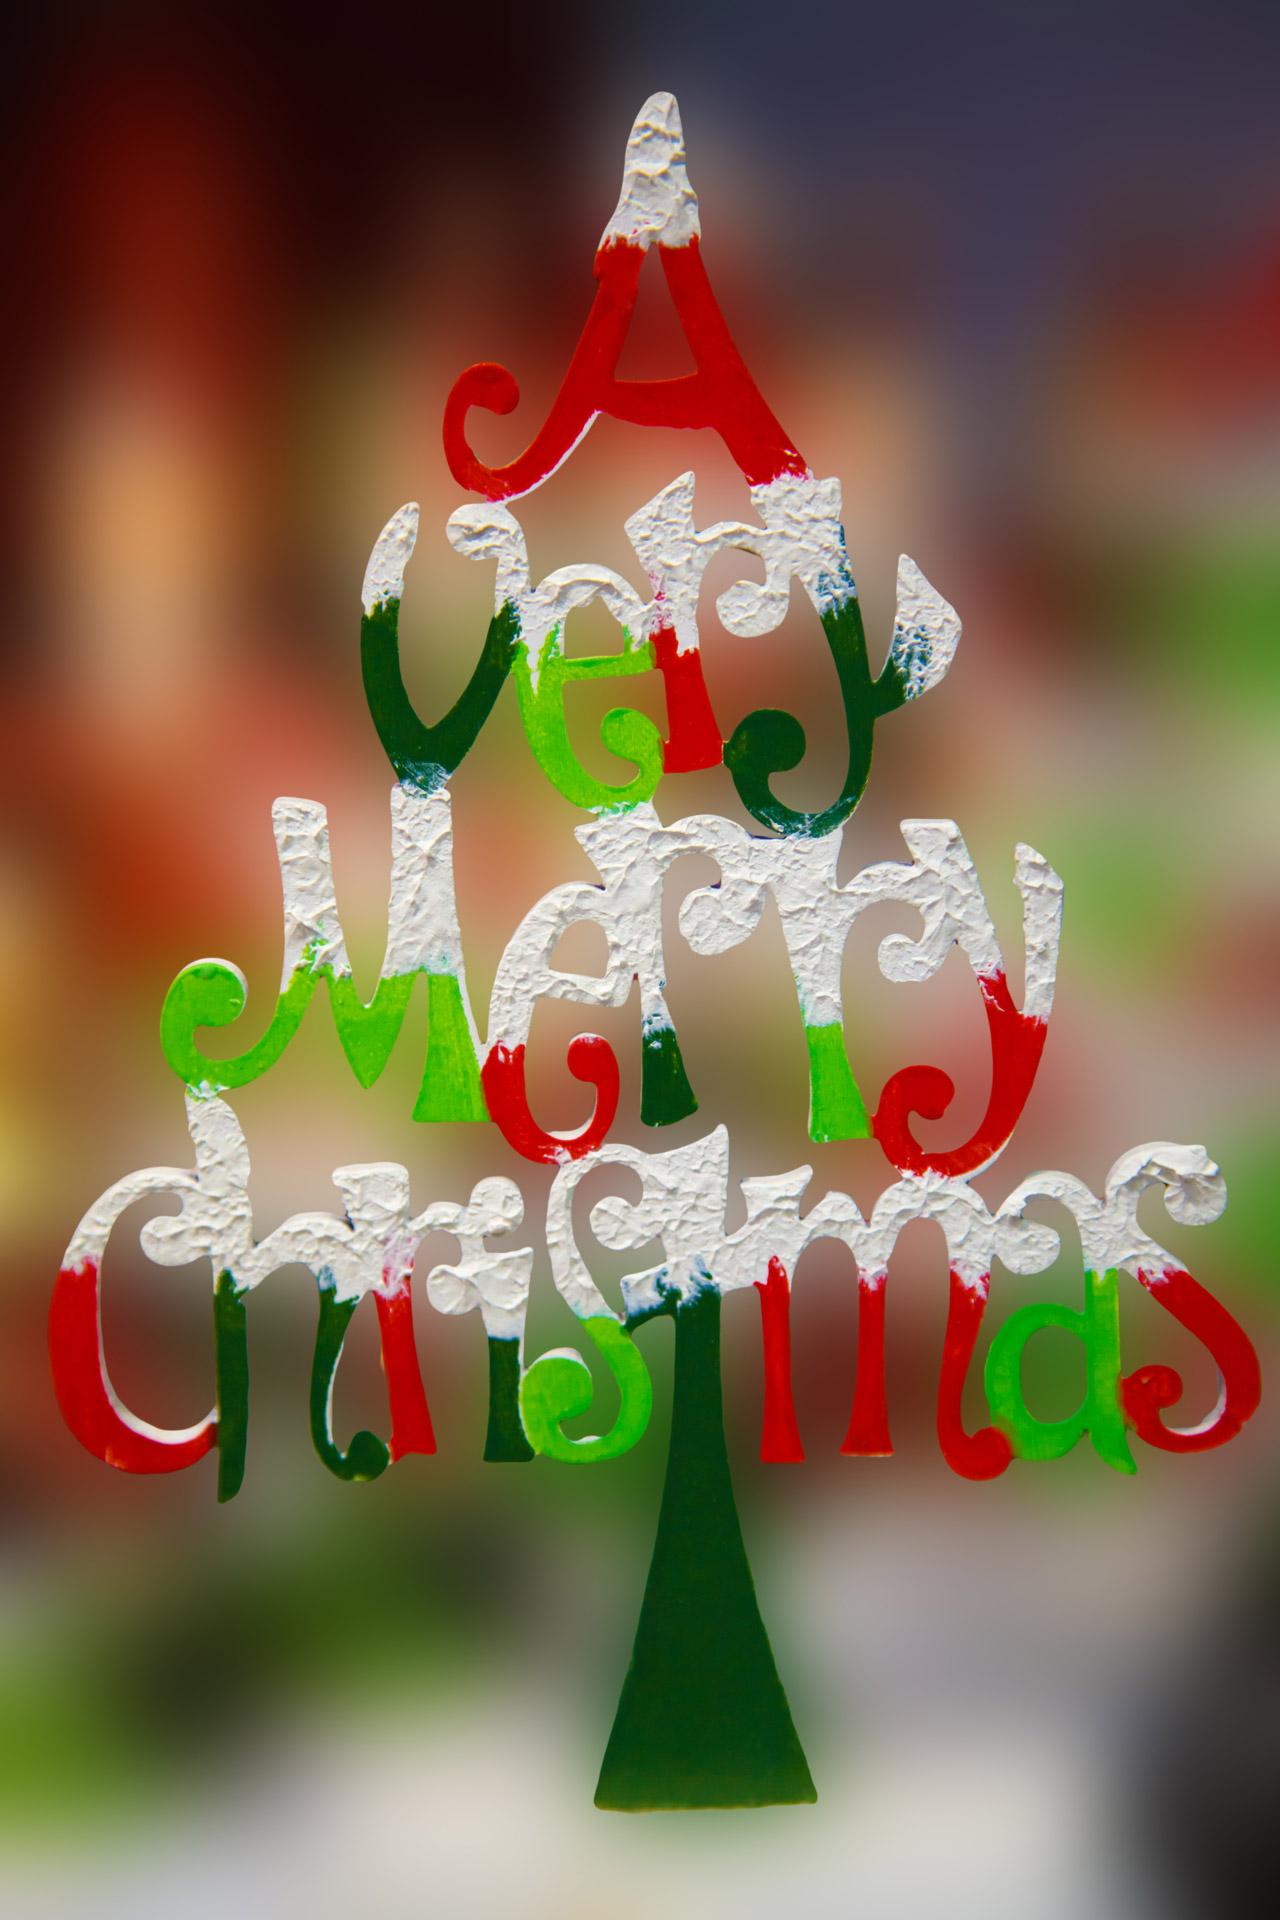 A Very Merry Christmas Free Stock Photo Public Domain